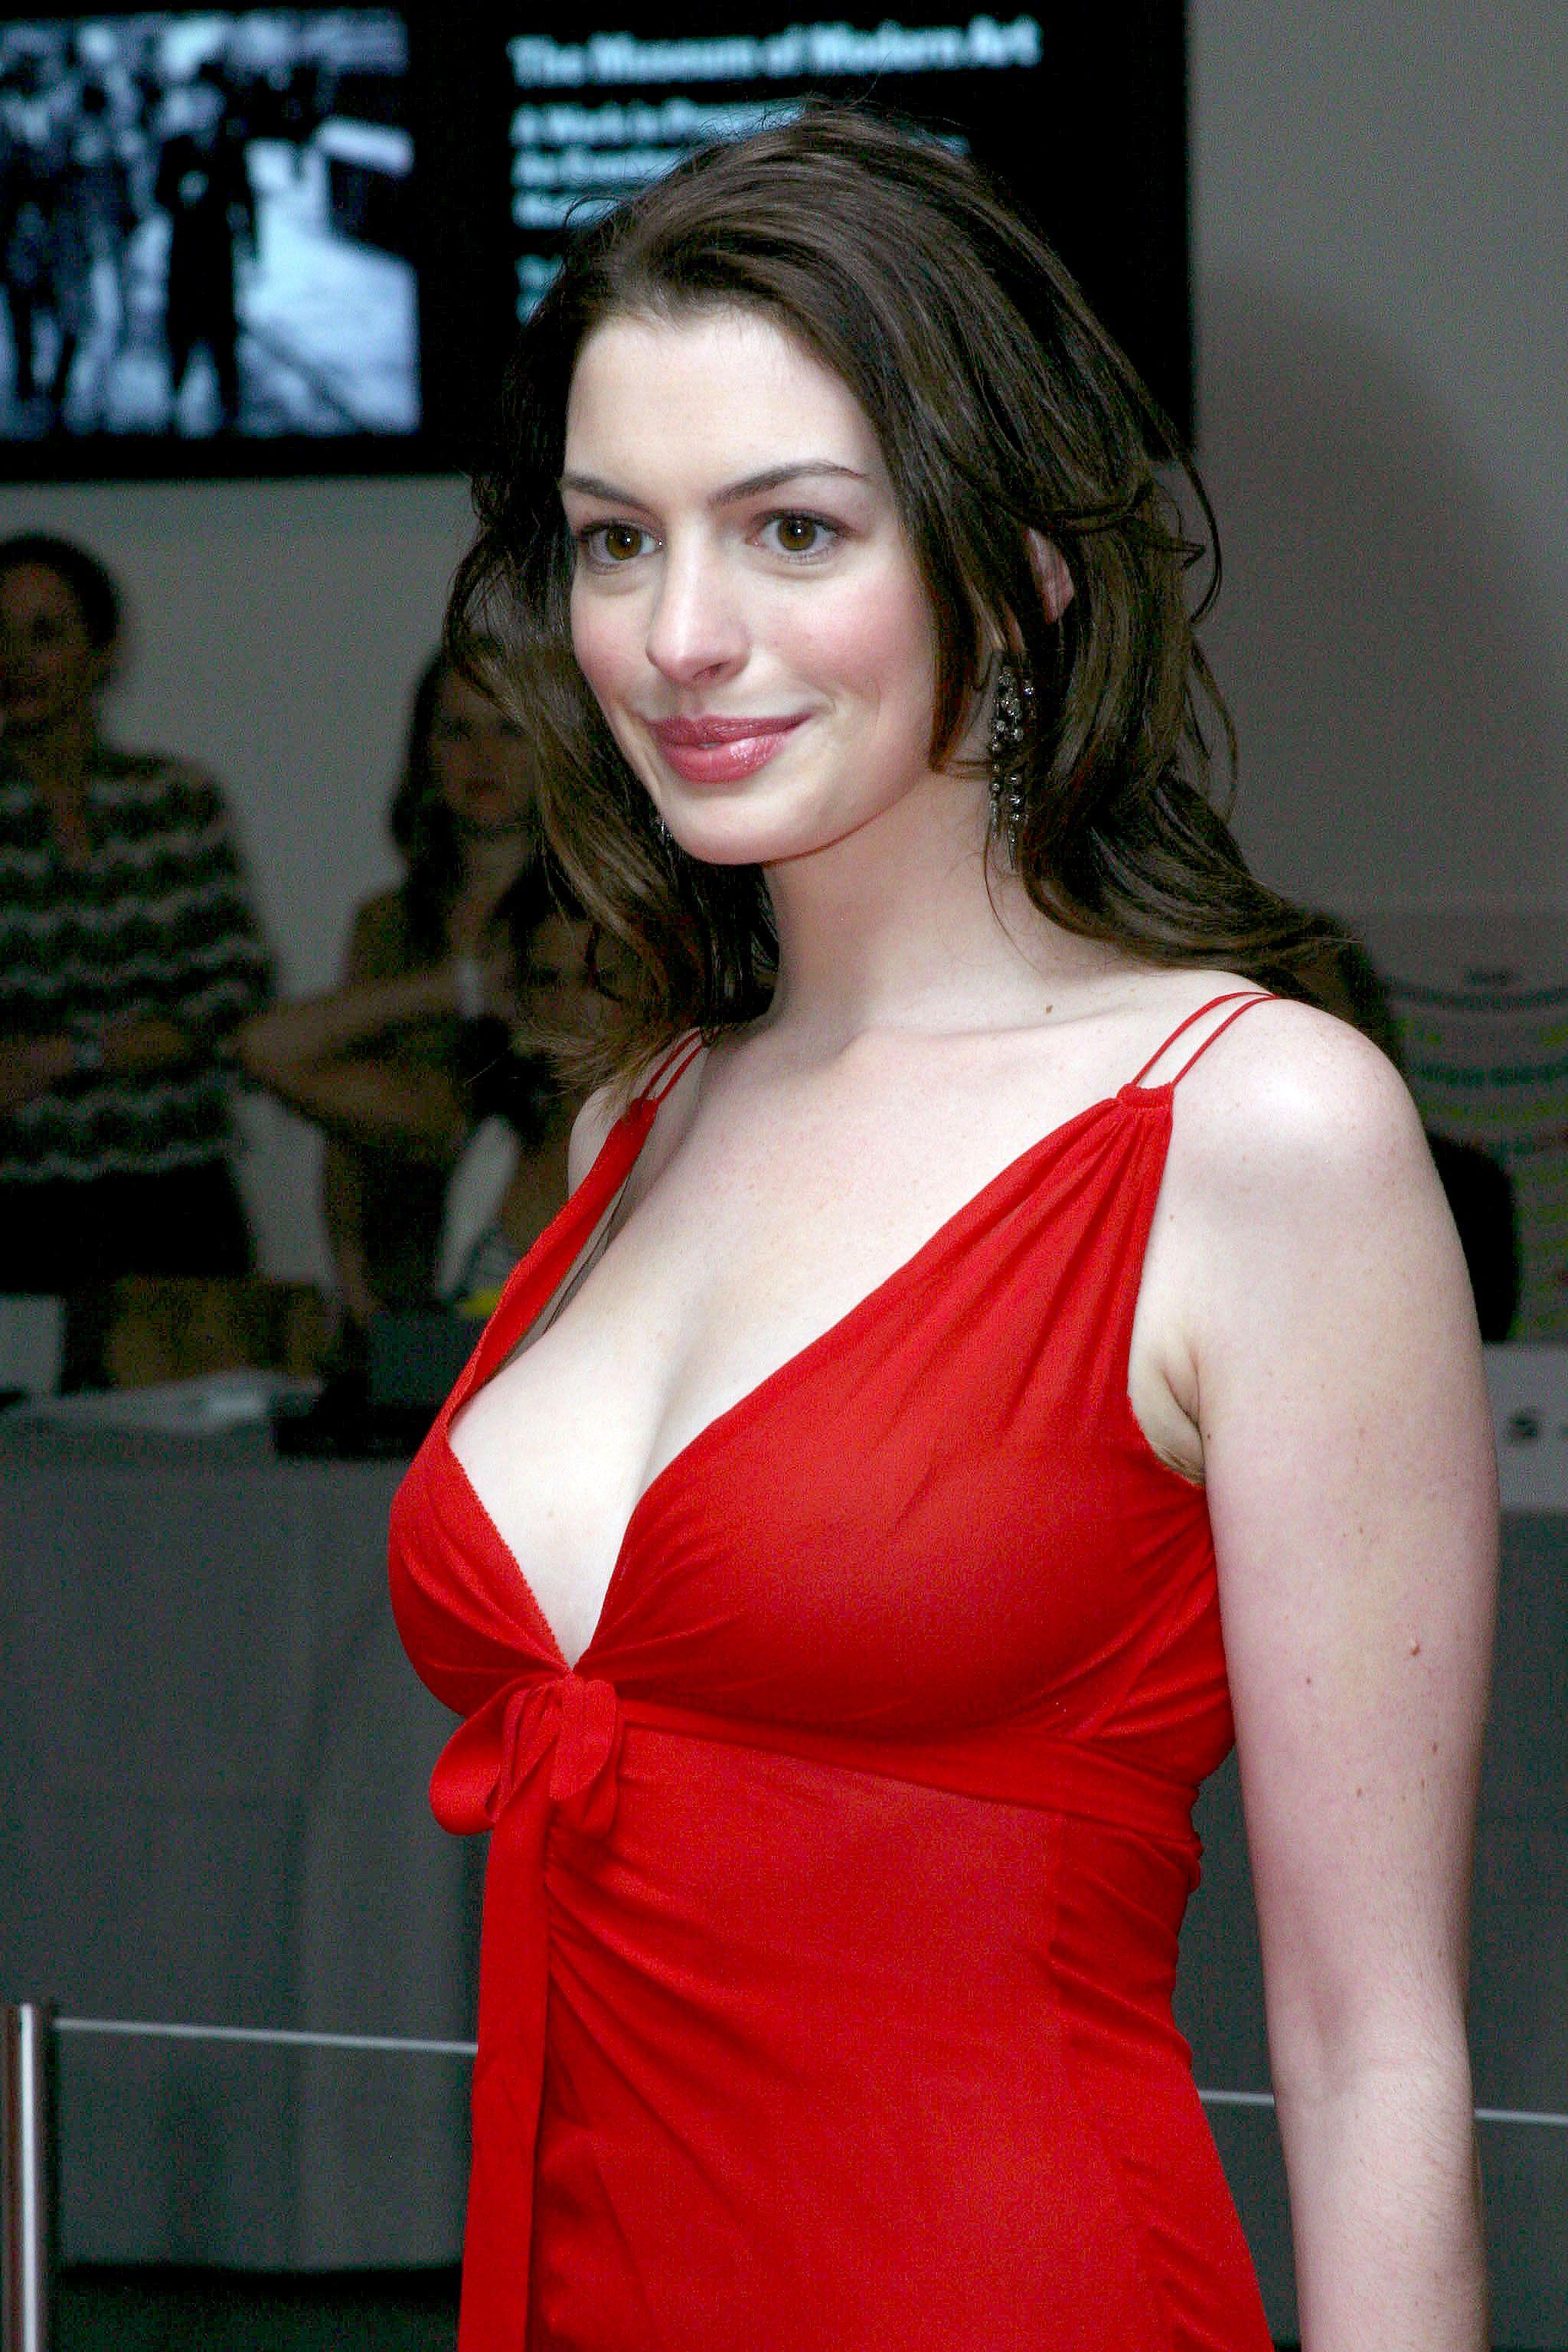 Ireland baldwin cleavage 2 pics advise